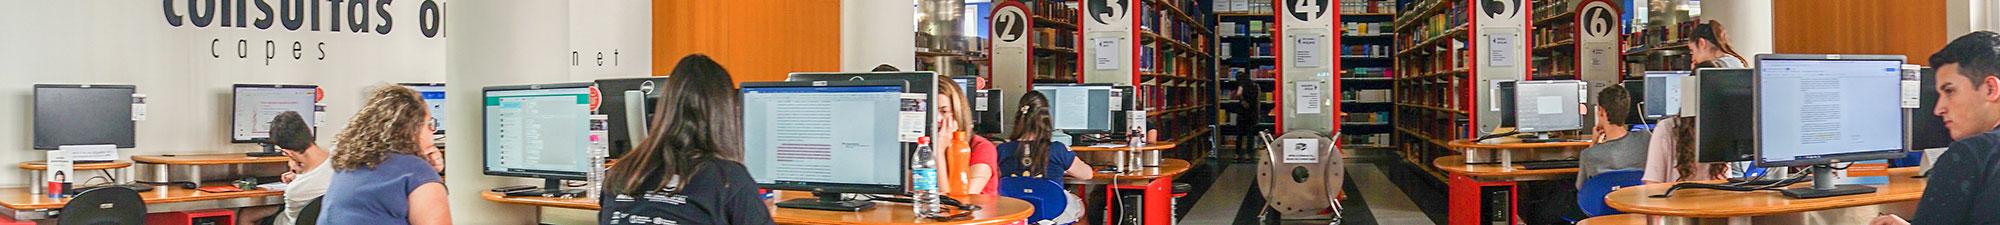 Jumbinho Biblioteca